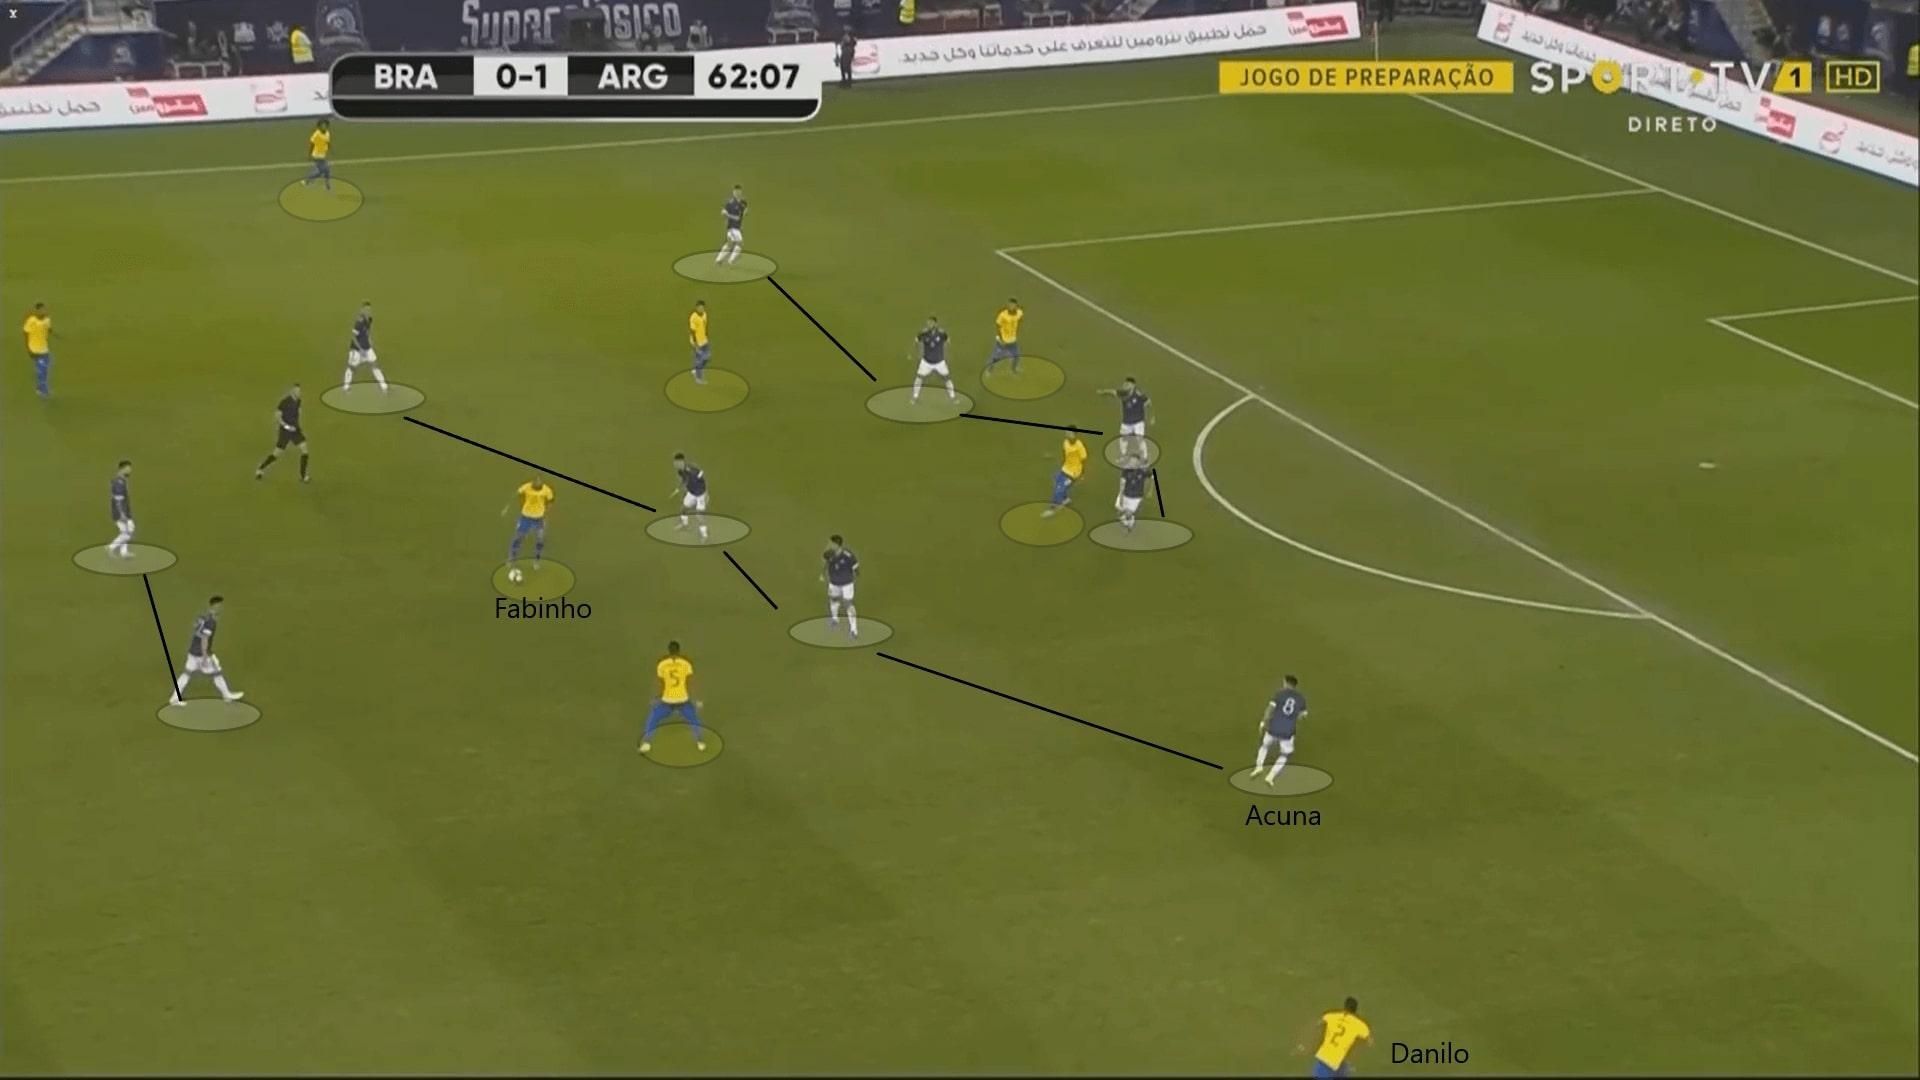 International Friendly 2019 - Brazil vs Argentina tactics